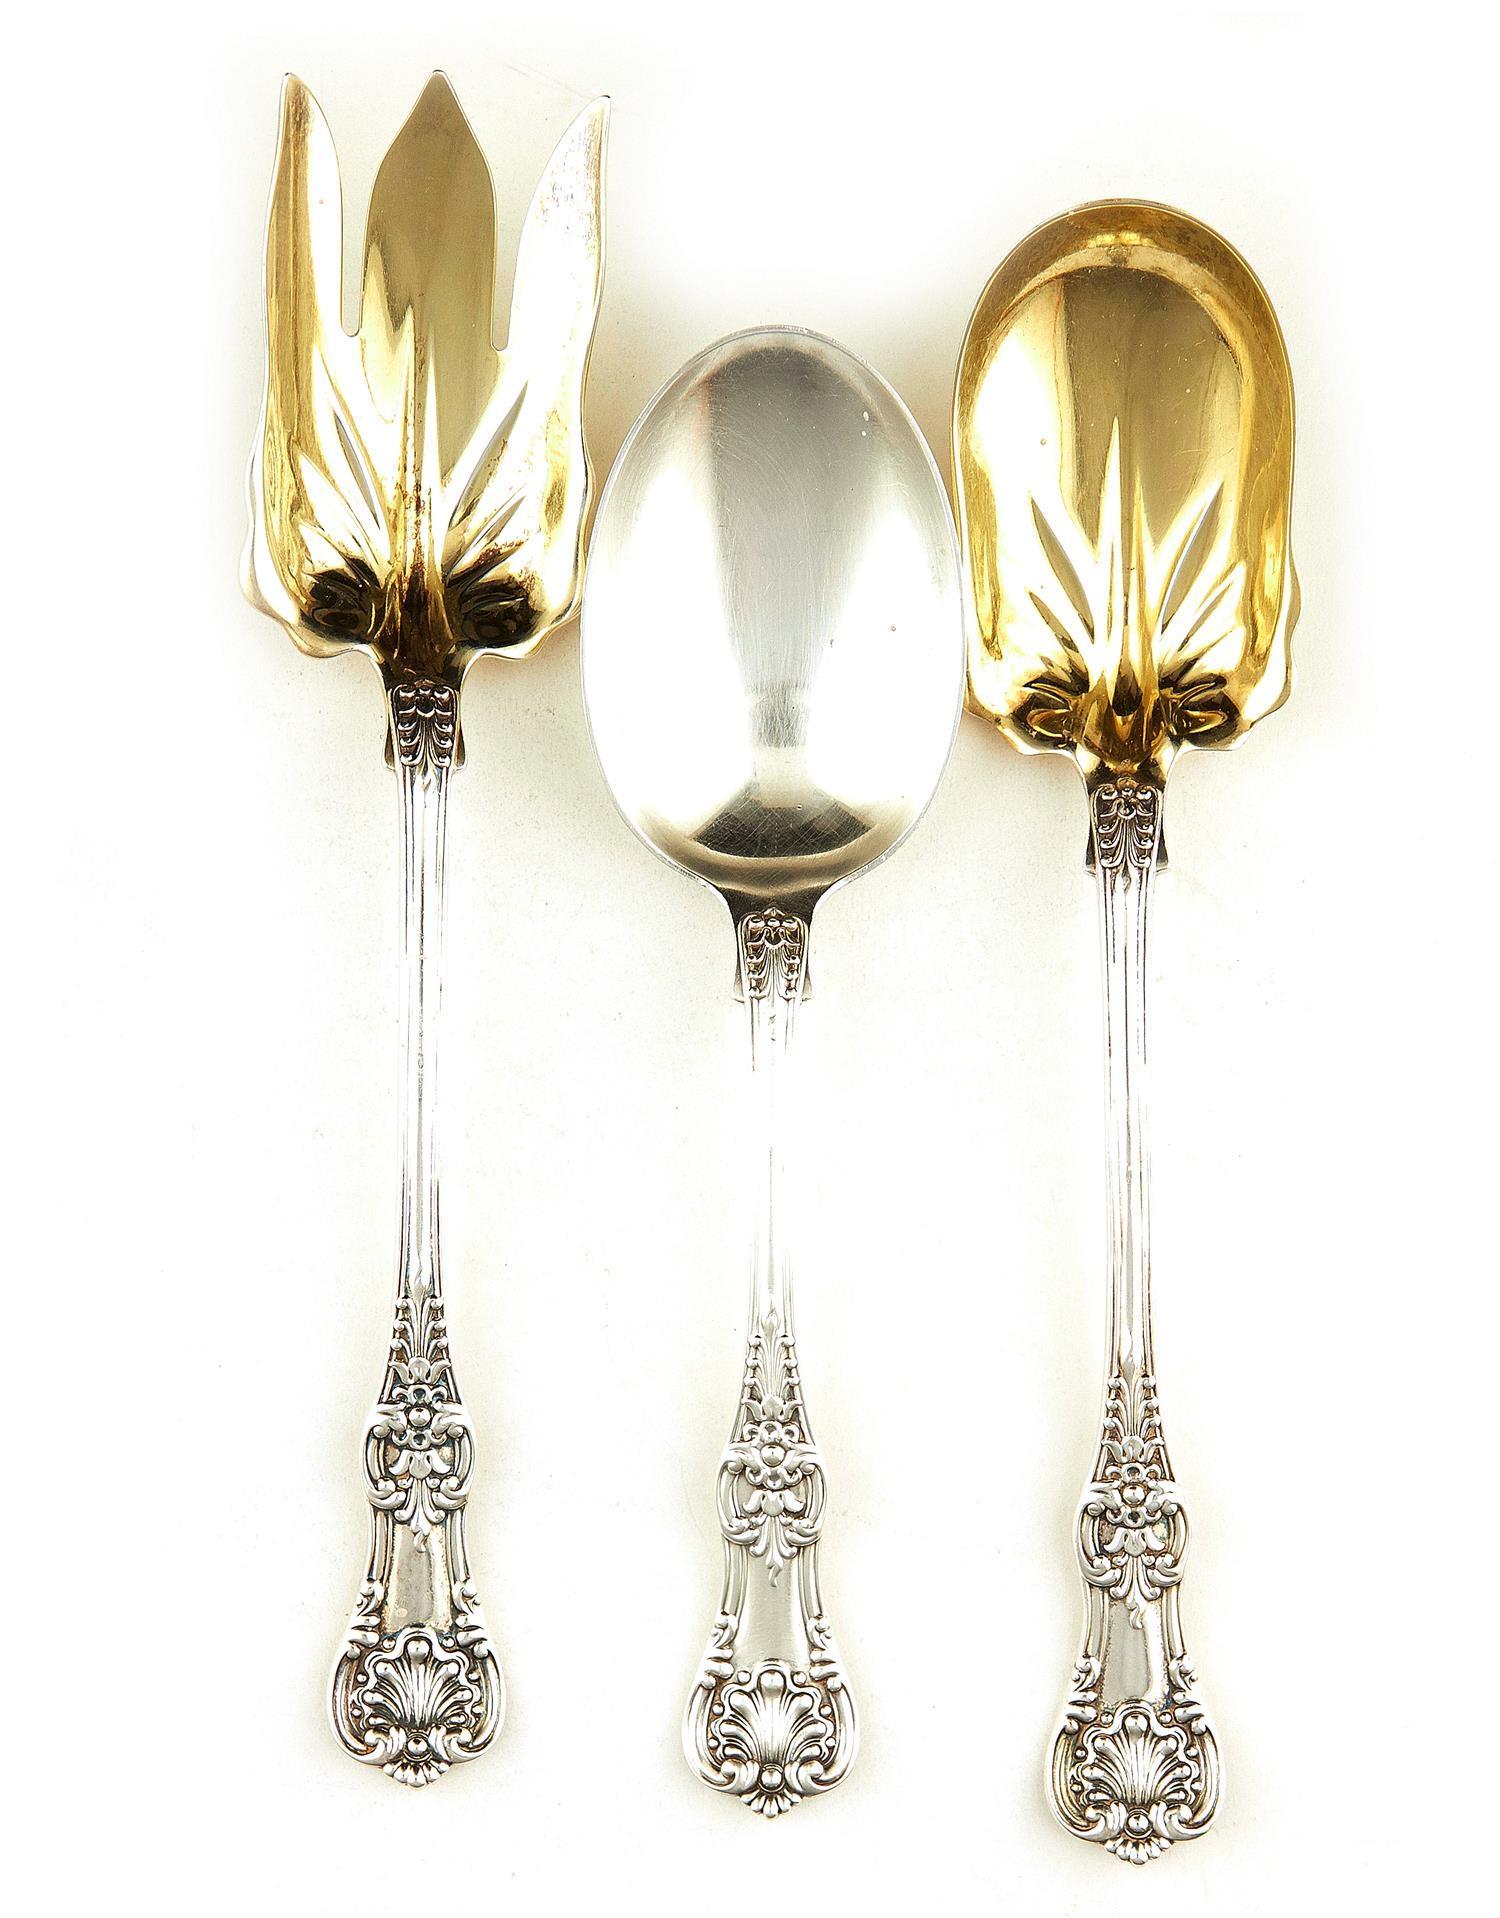 American silver flatware serving pieces, Tiffany & Co (3pcs)